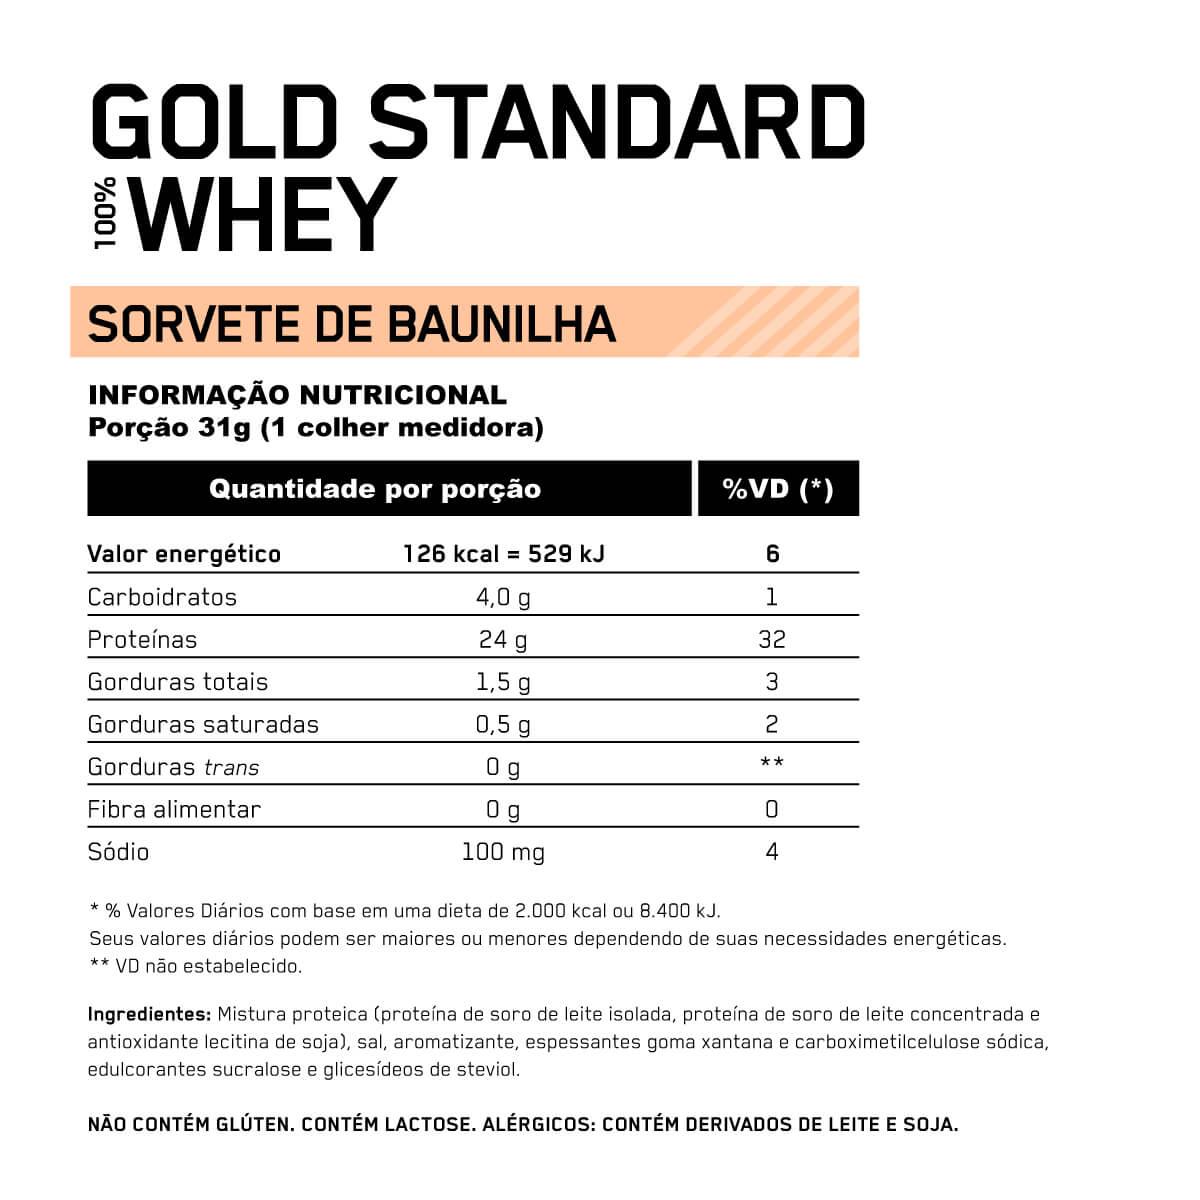 100 WHEY GOLD STANDARD (NOVA EMBALAGEM) (900G) - OPTIMUM NUTRITION - BAUNILHA